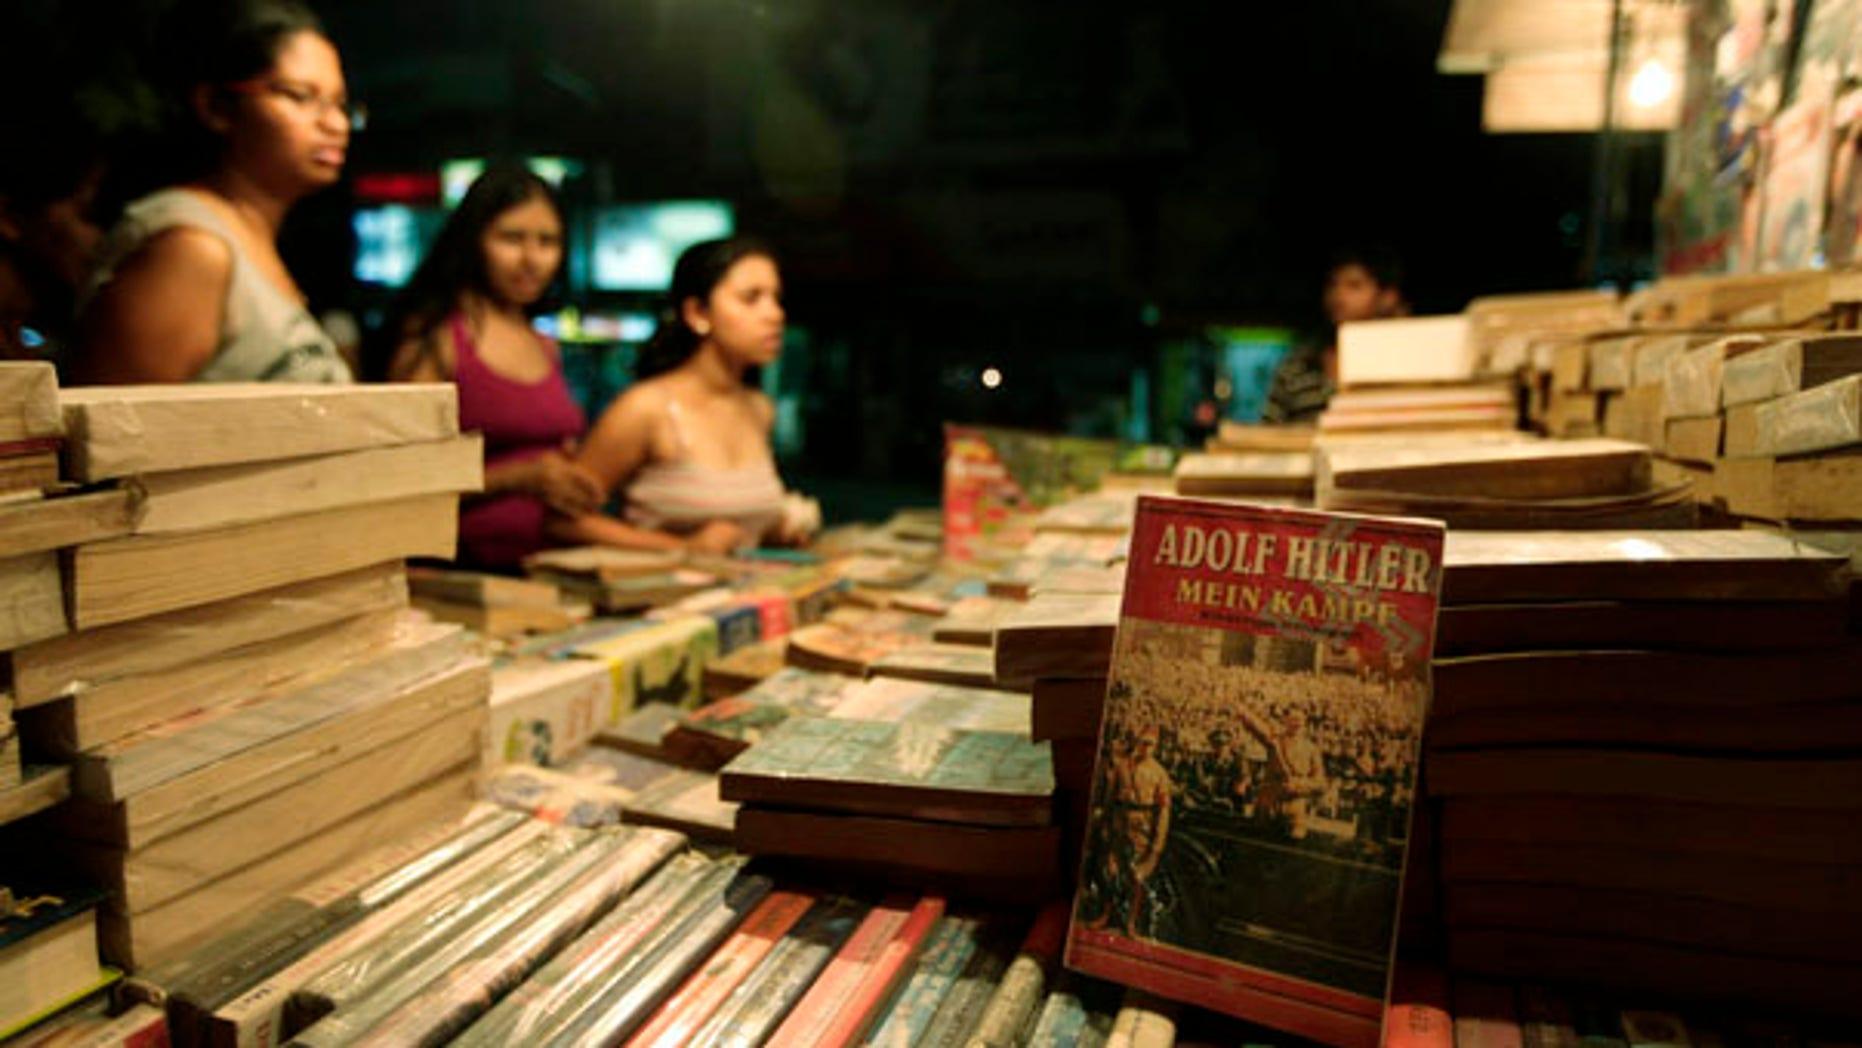 June 23: Adolf Hitler's Mein Kampf is displayed at a roadside book shop in New Delhi, India.